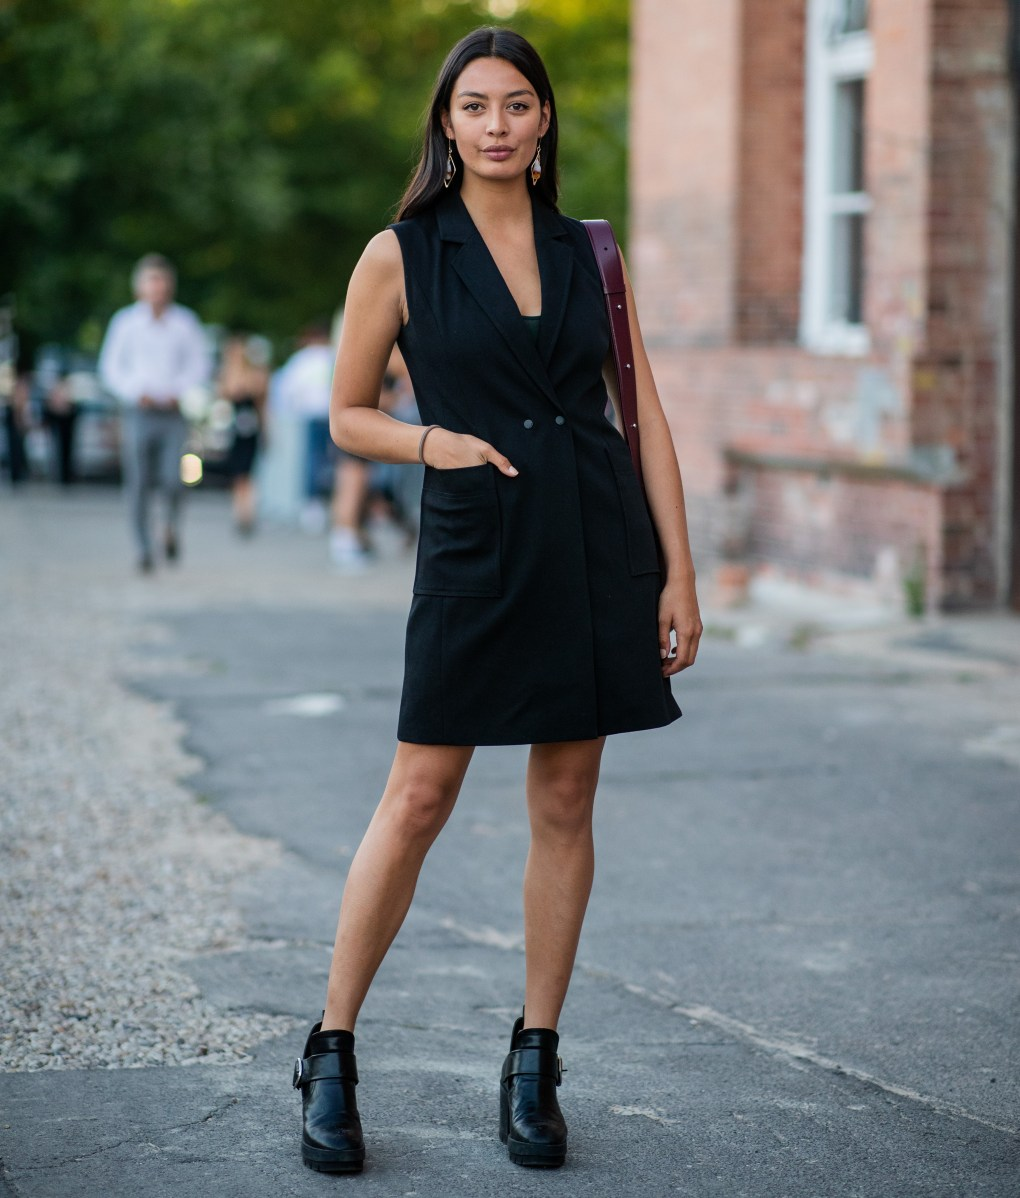 woman wearing a v neck black dress